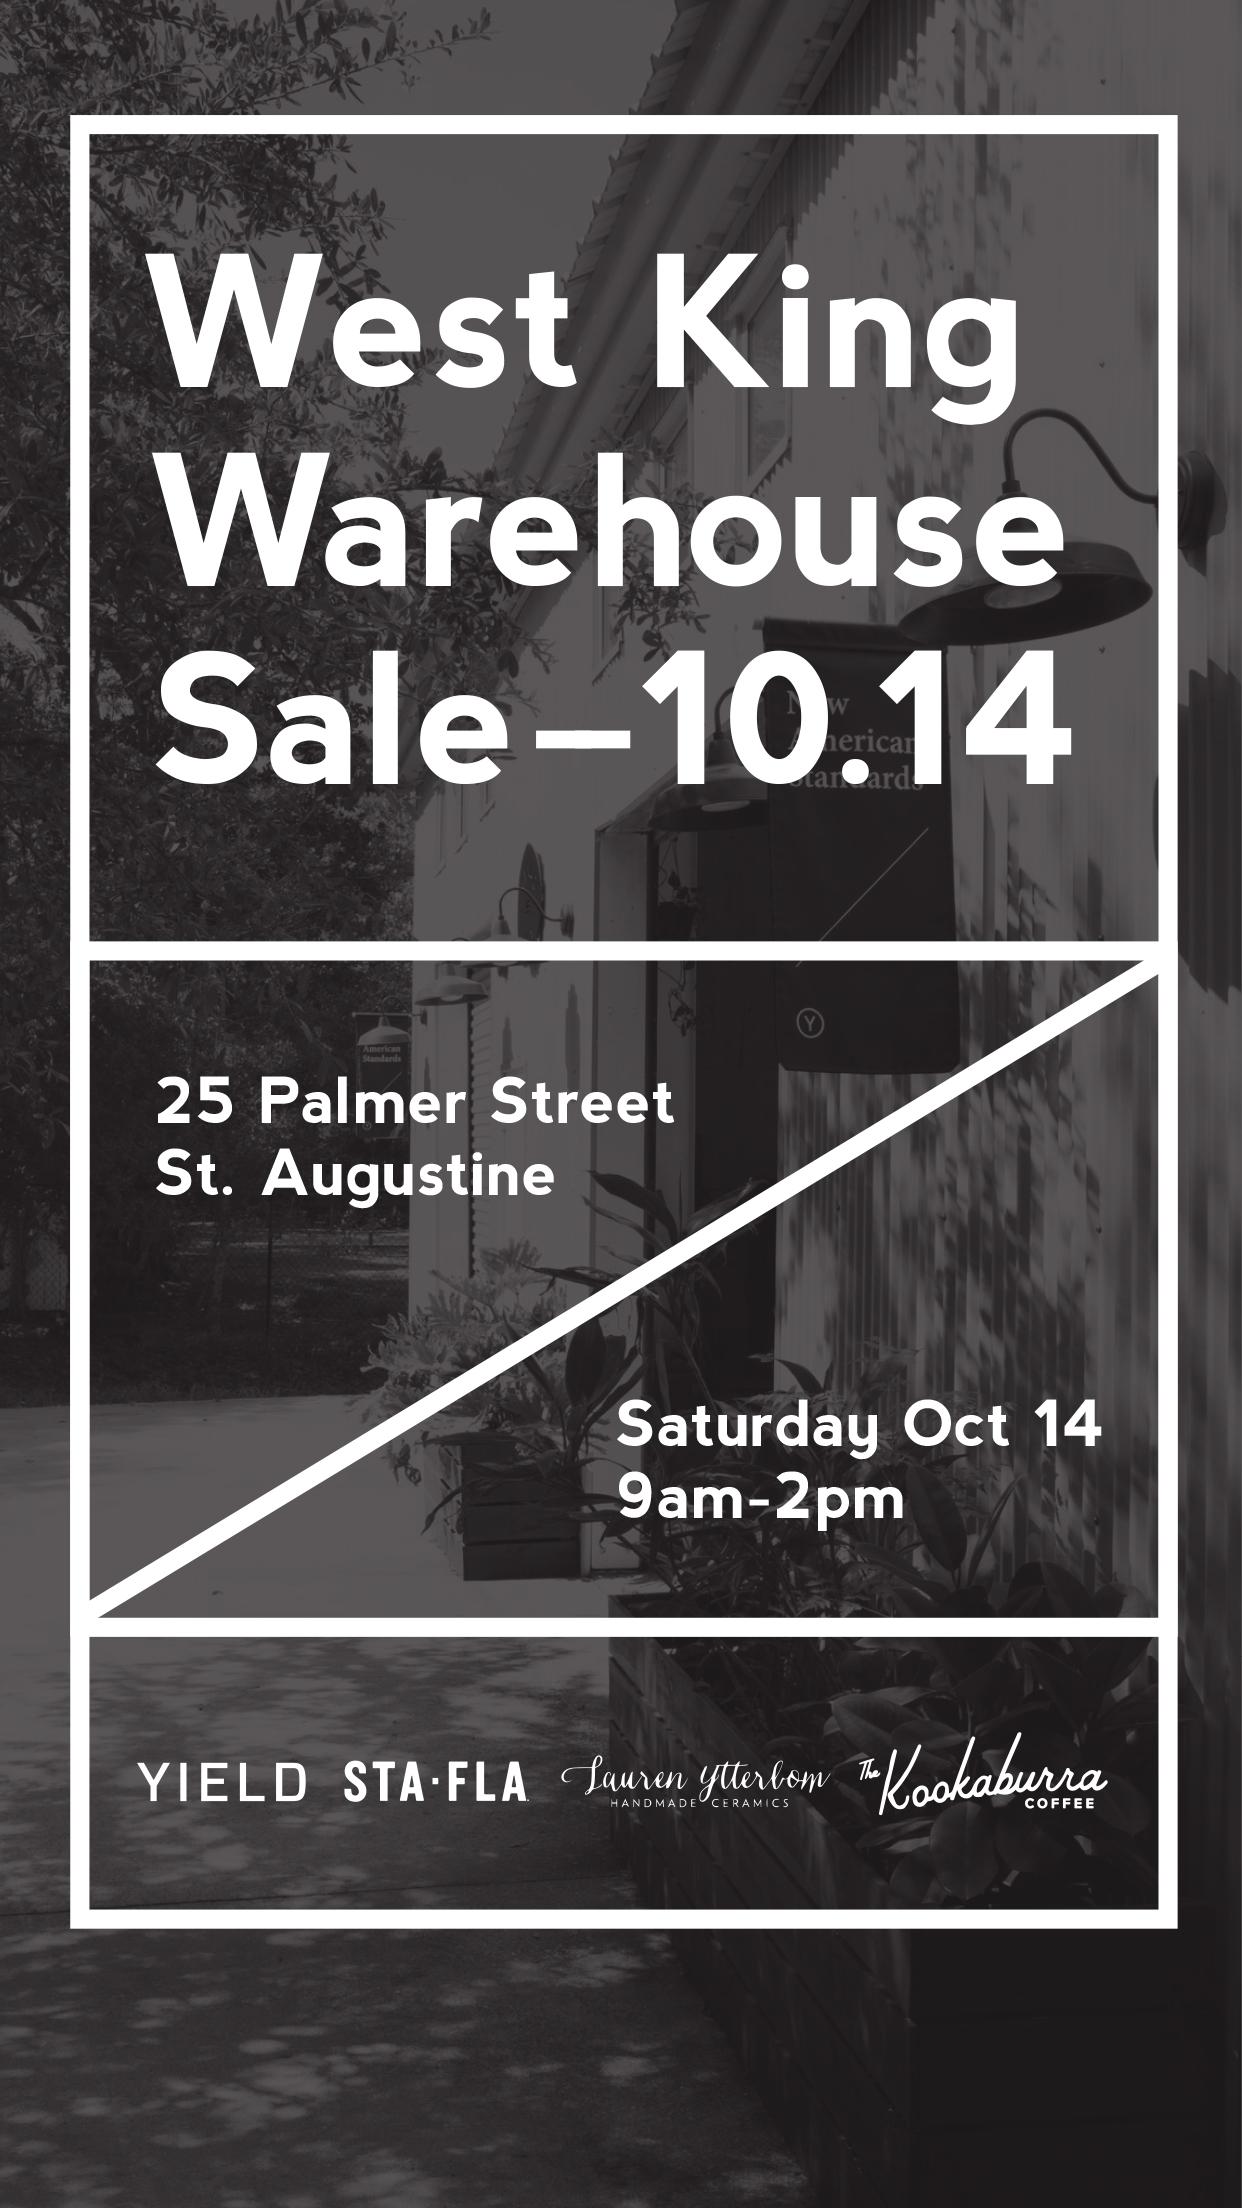 warehouse_instastory_2.jpg